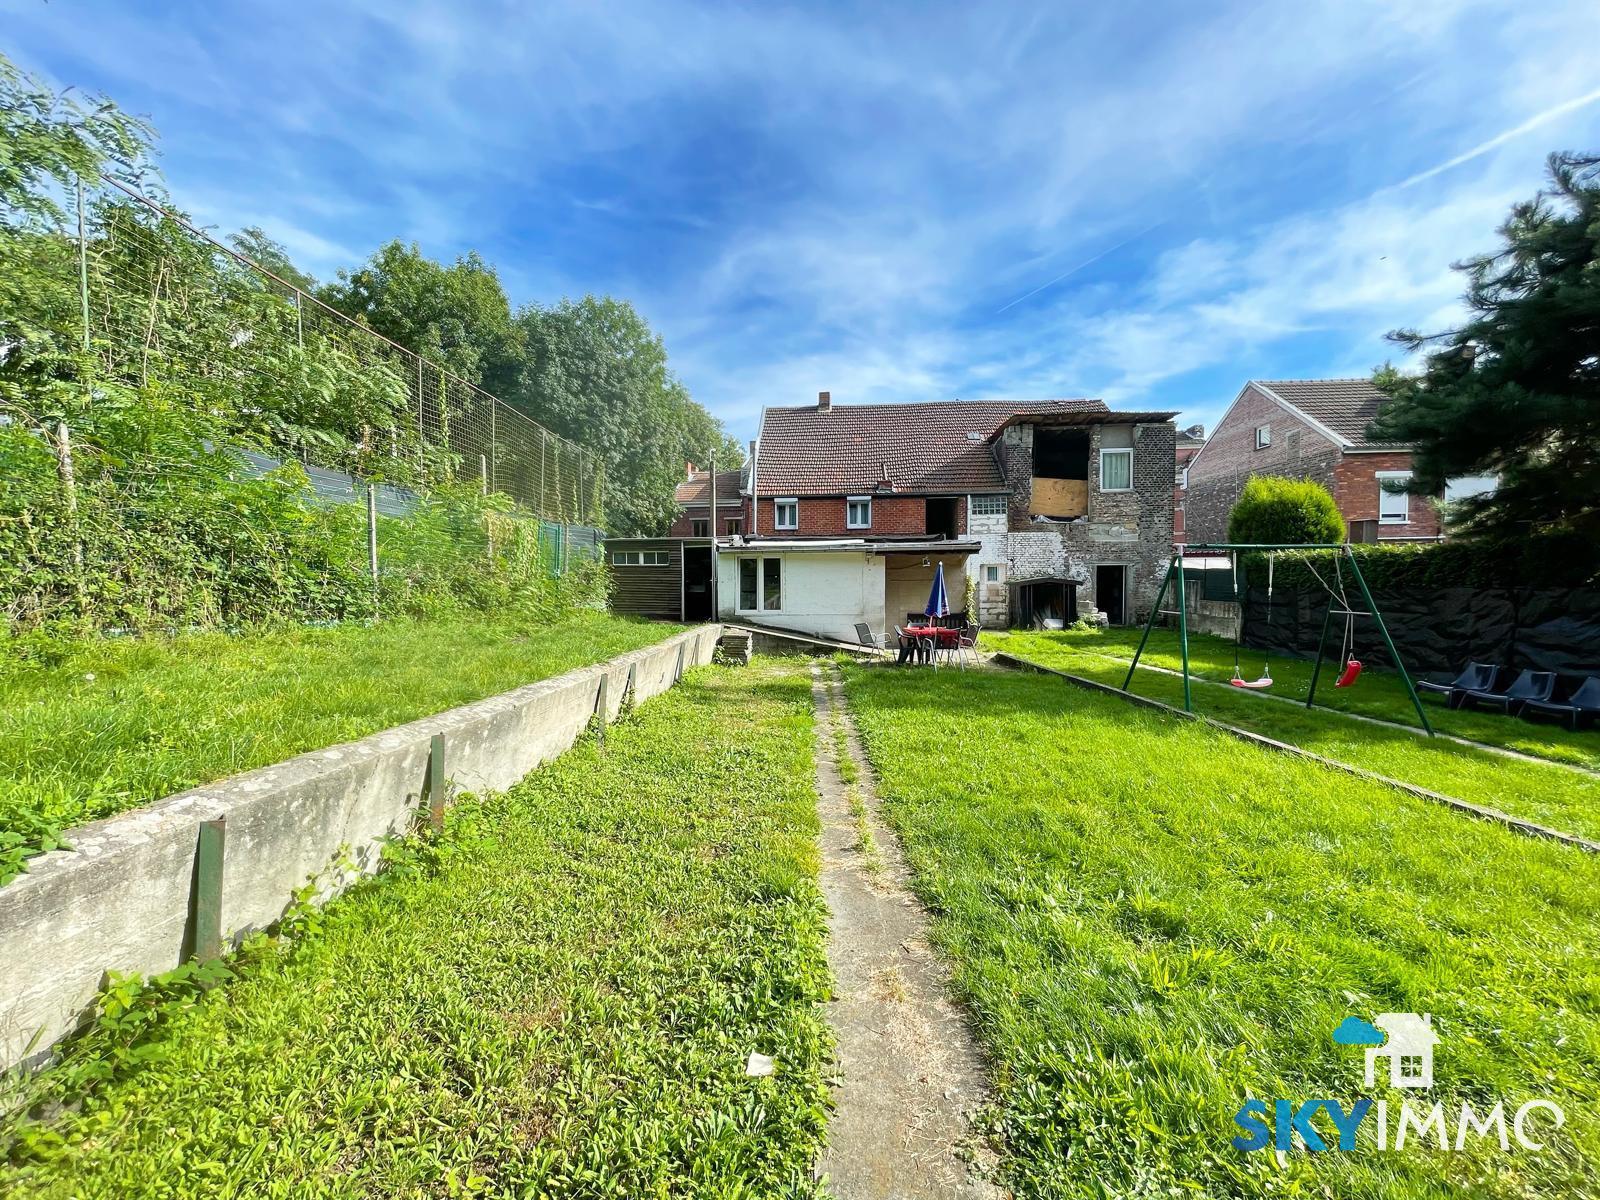 Maison - Seraing Jemeppesur-Meuse - #4517380-19